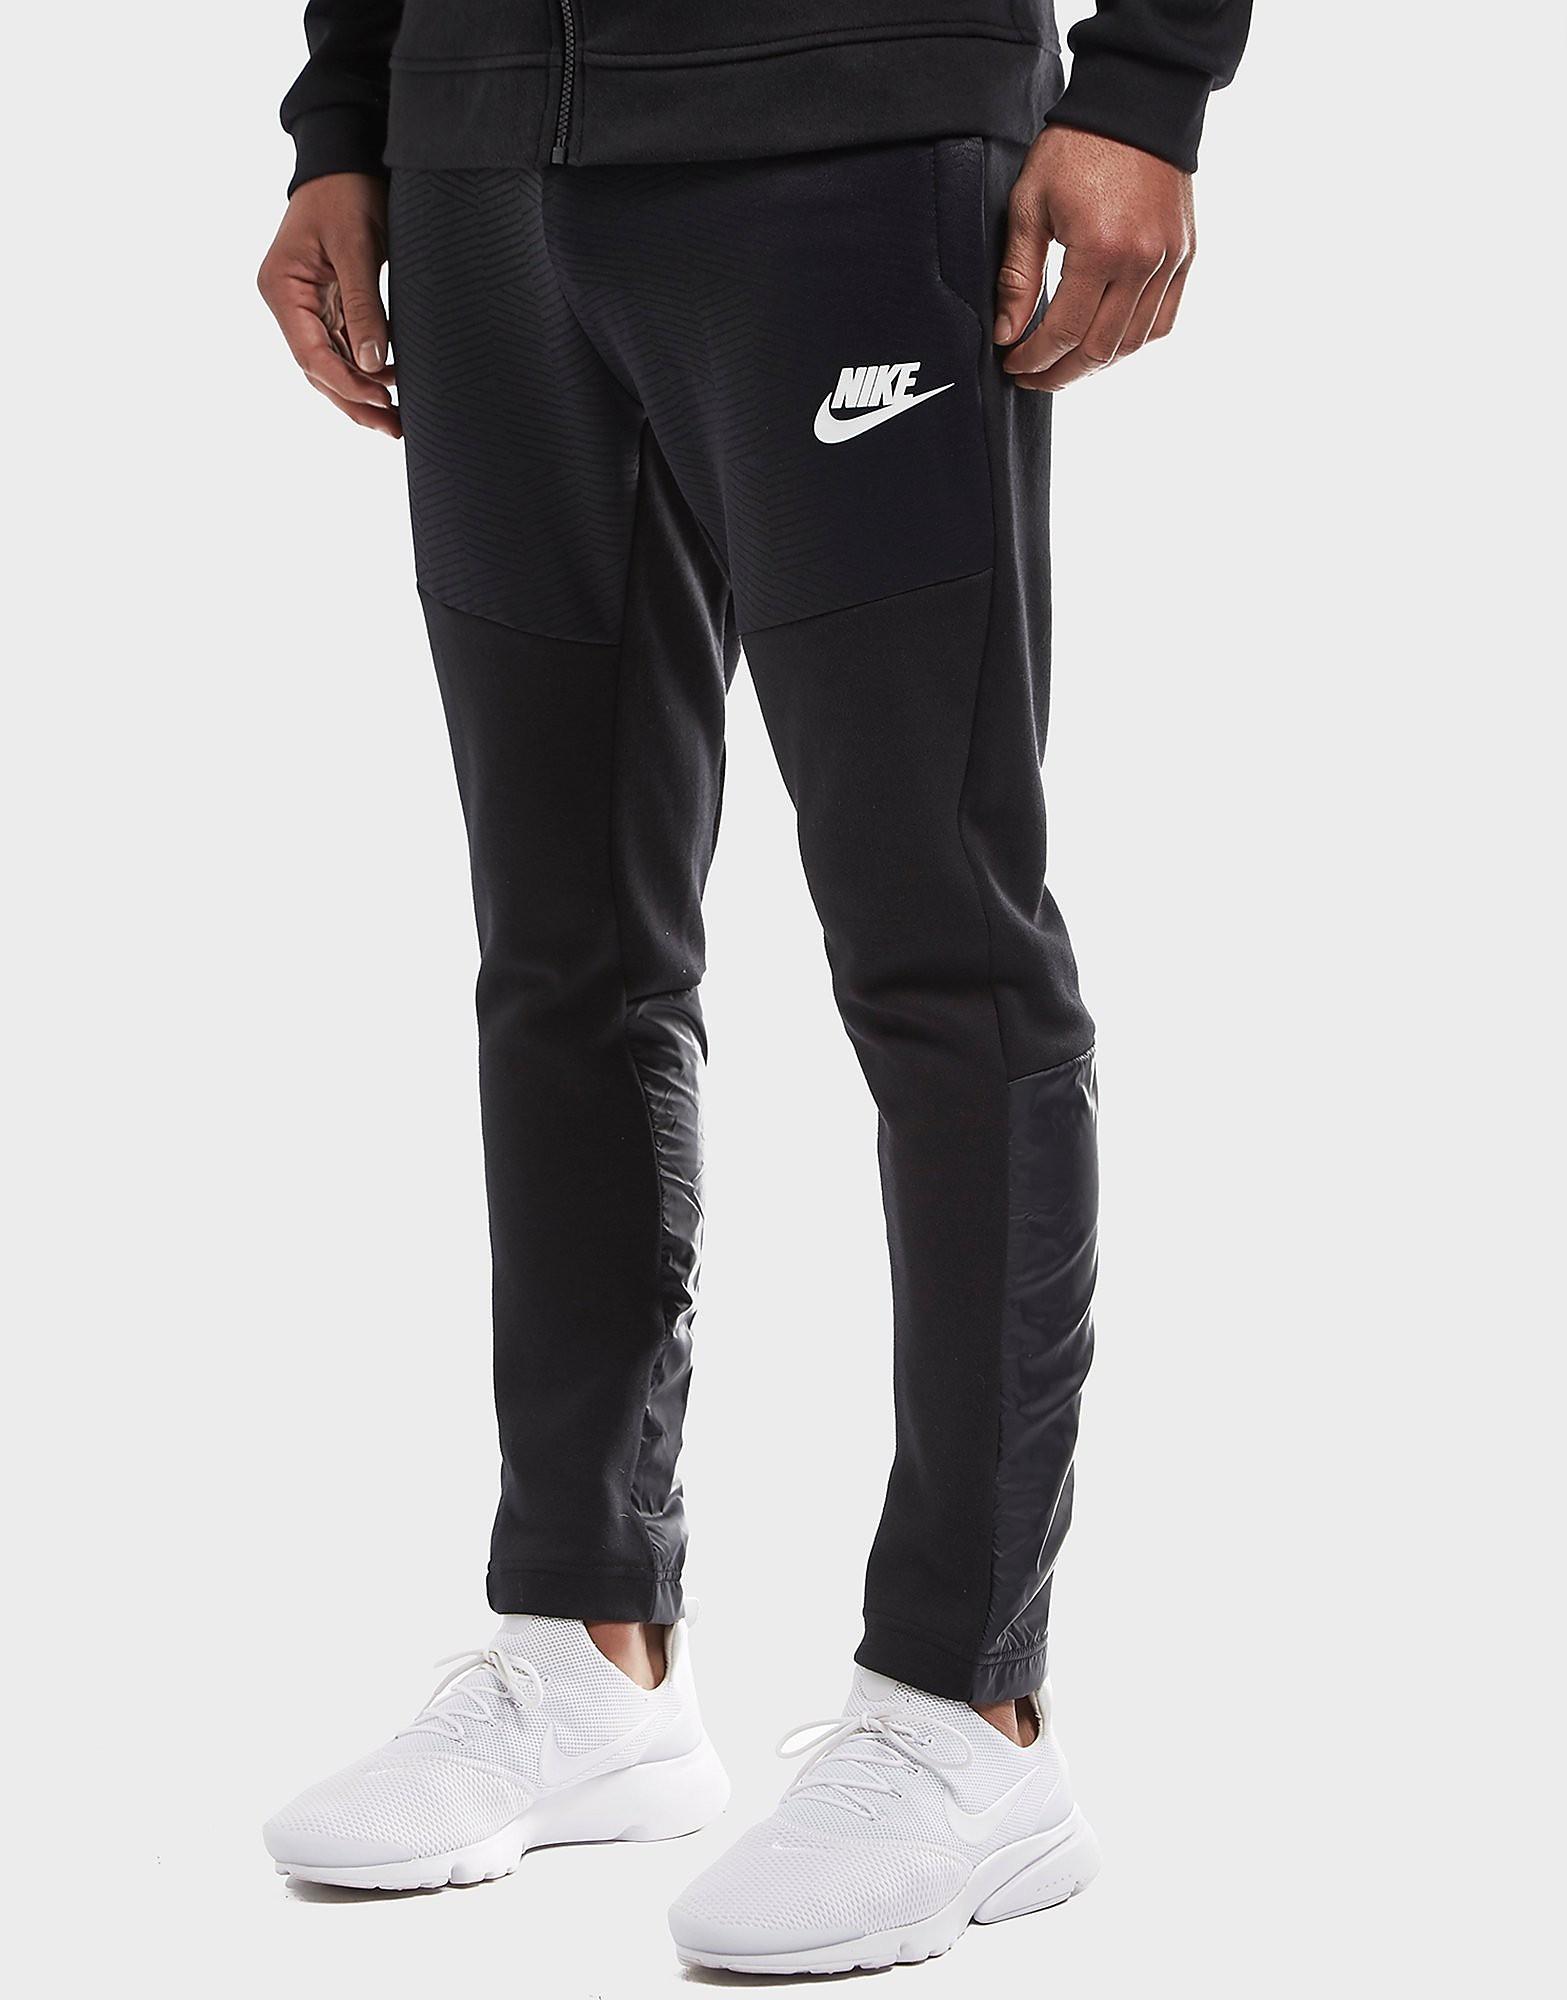 Nike Advance Fleece Joggers